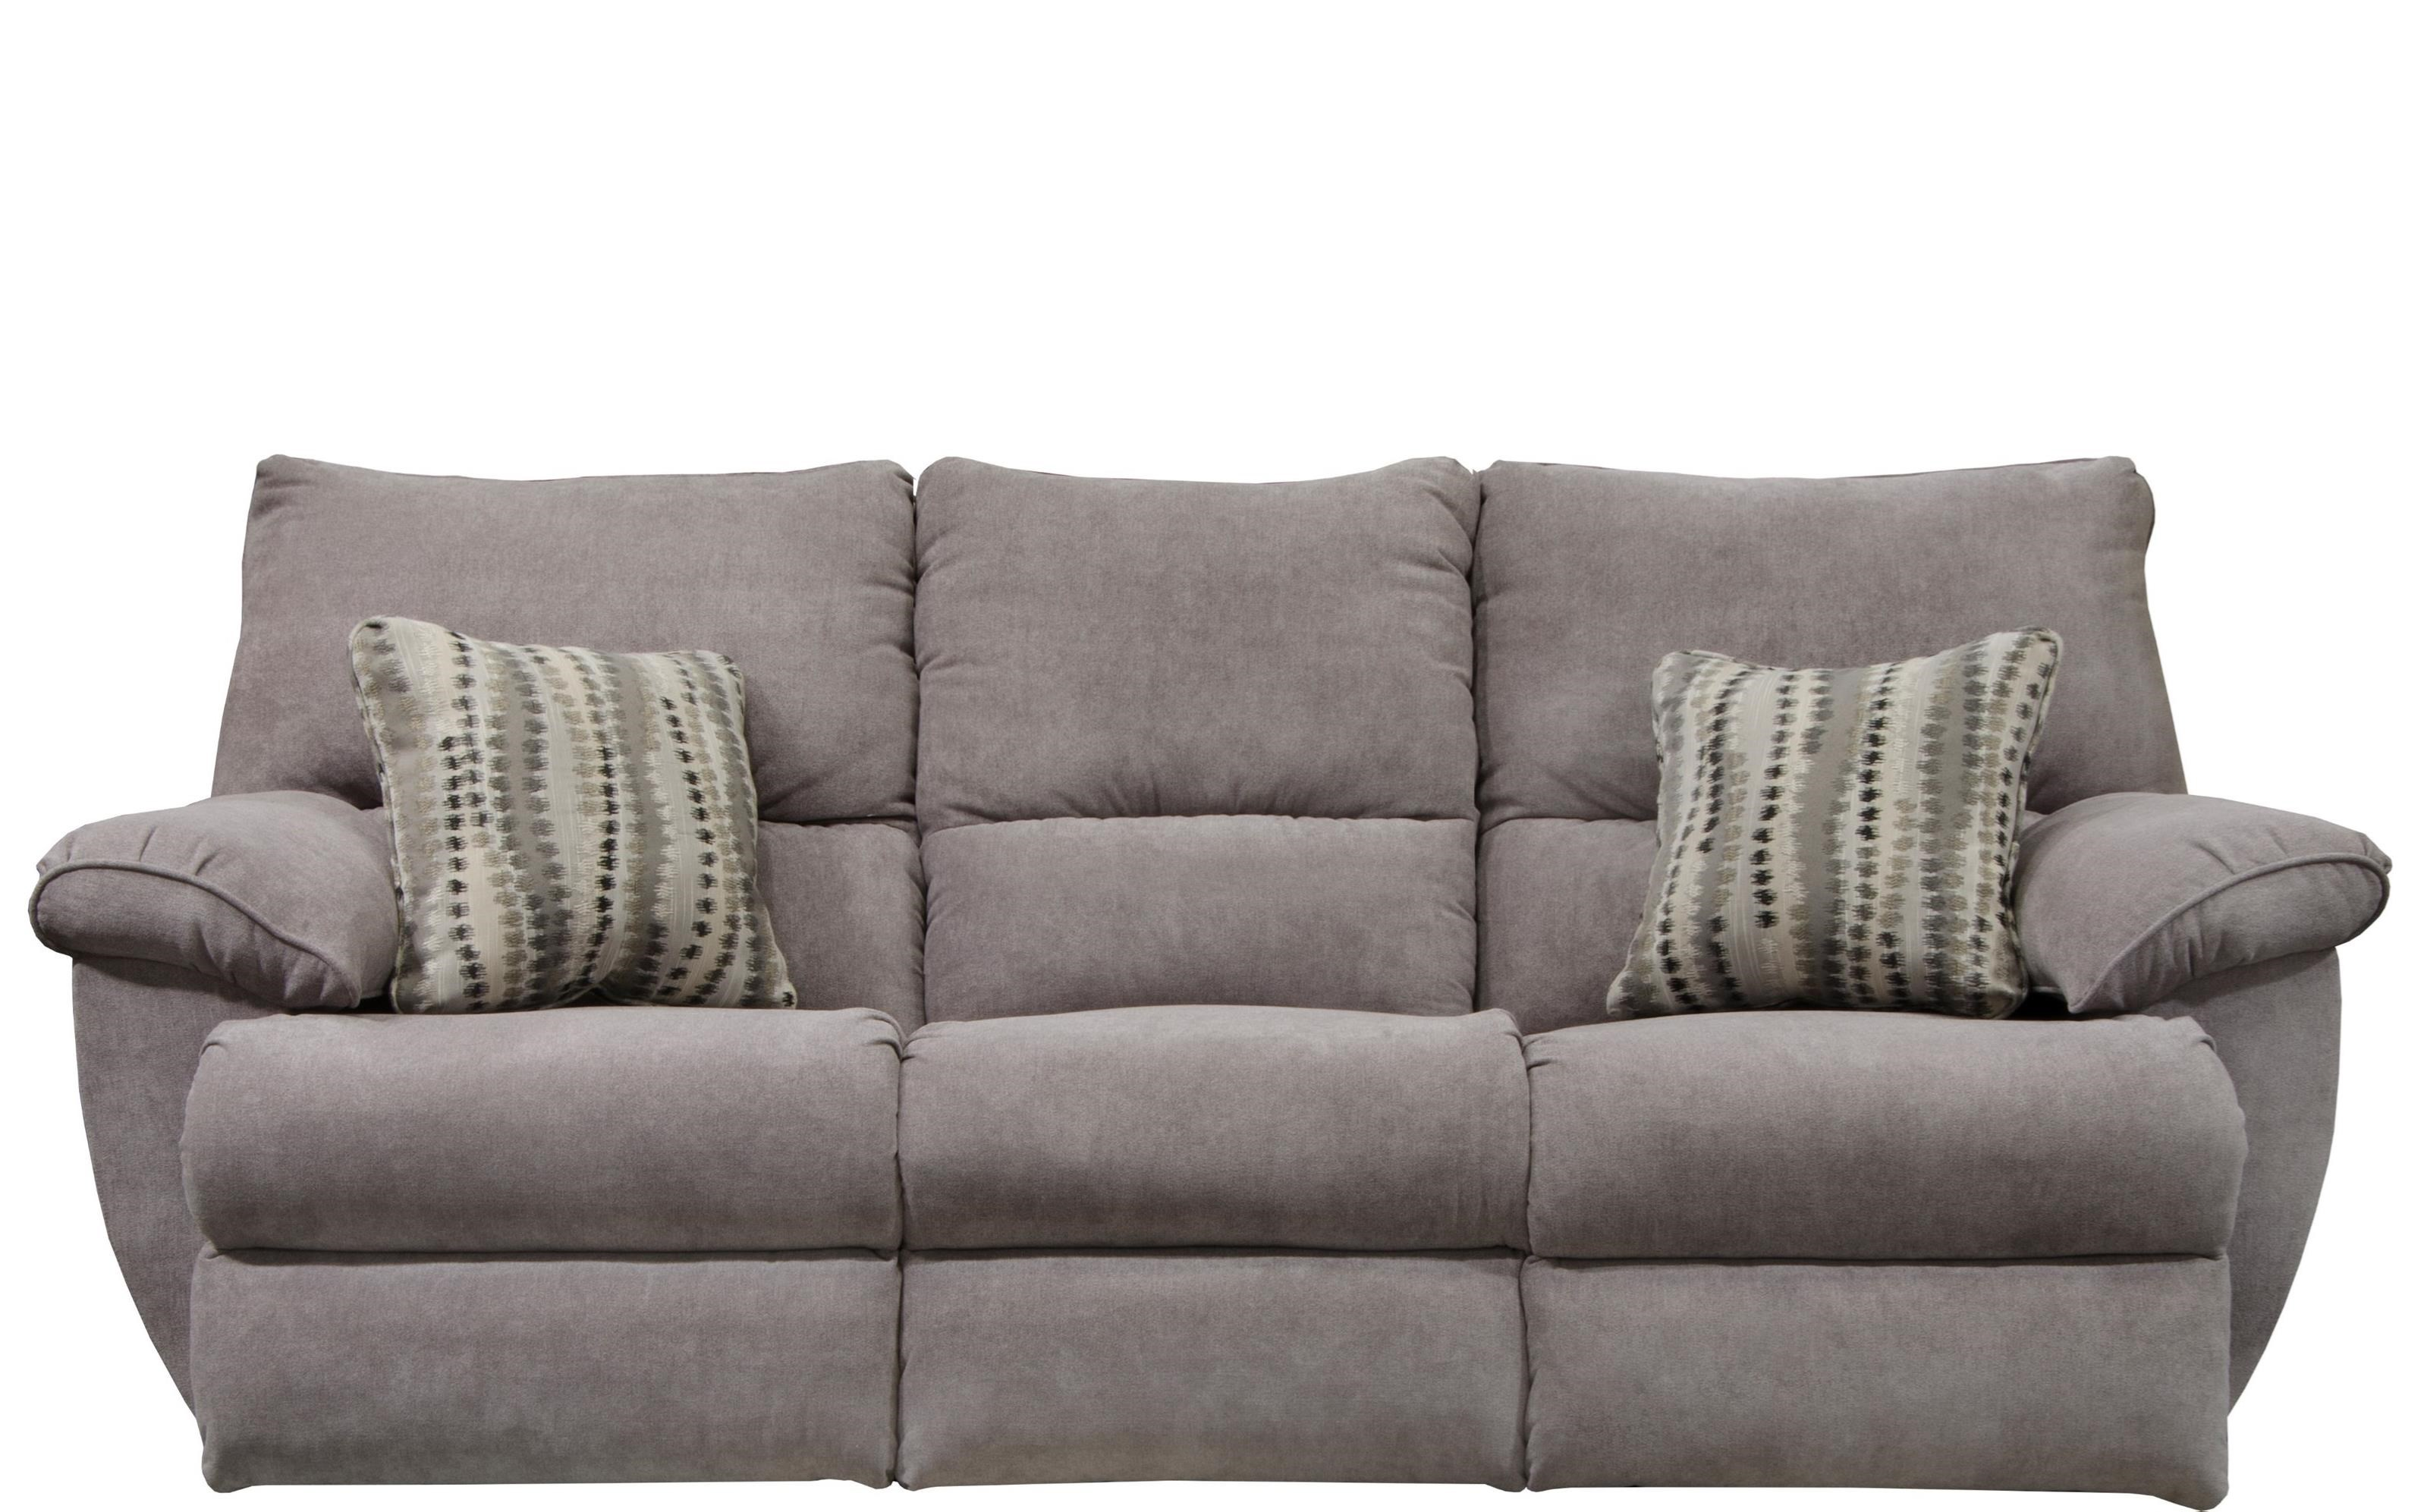 Sadler Reclining Sofa by Catnapper at EFO Furniture Outlet